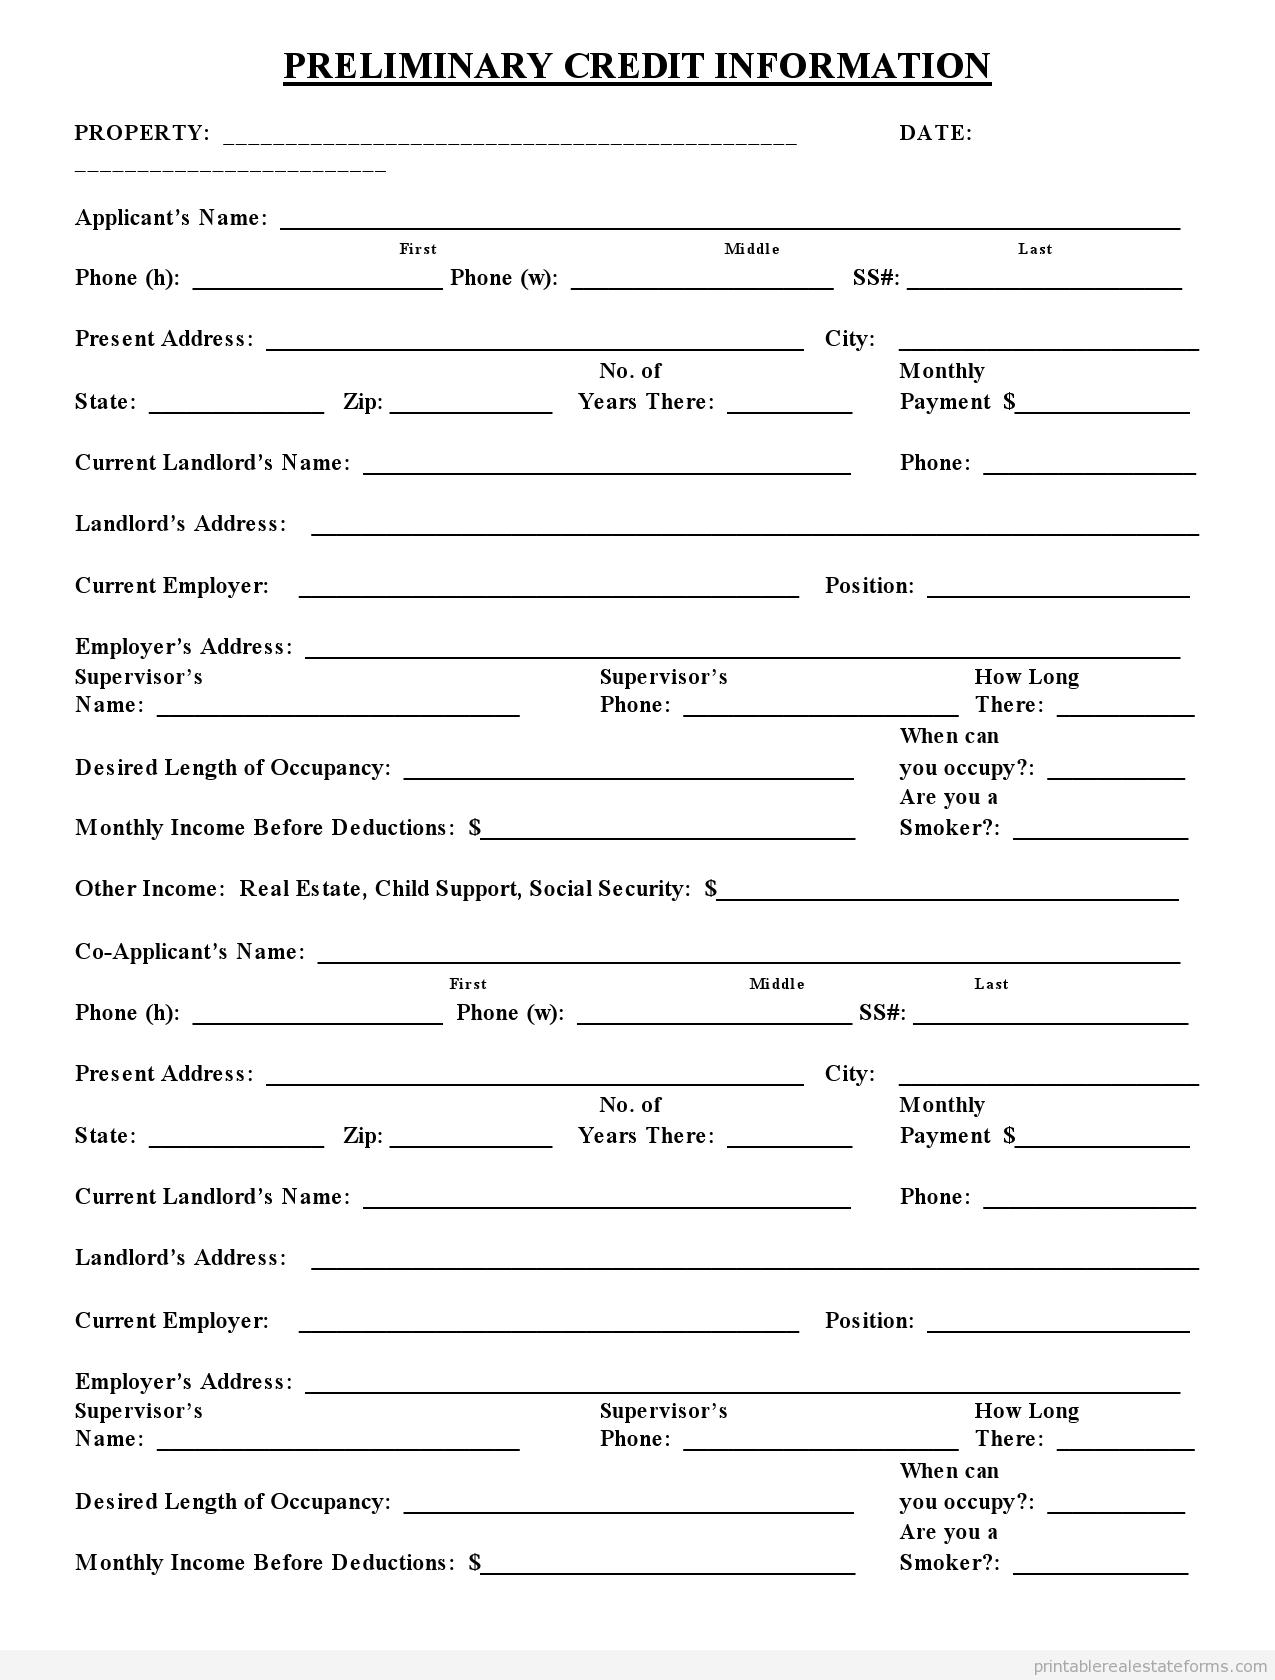 Sample Printable Preliminary Credit Application 2 Form